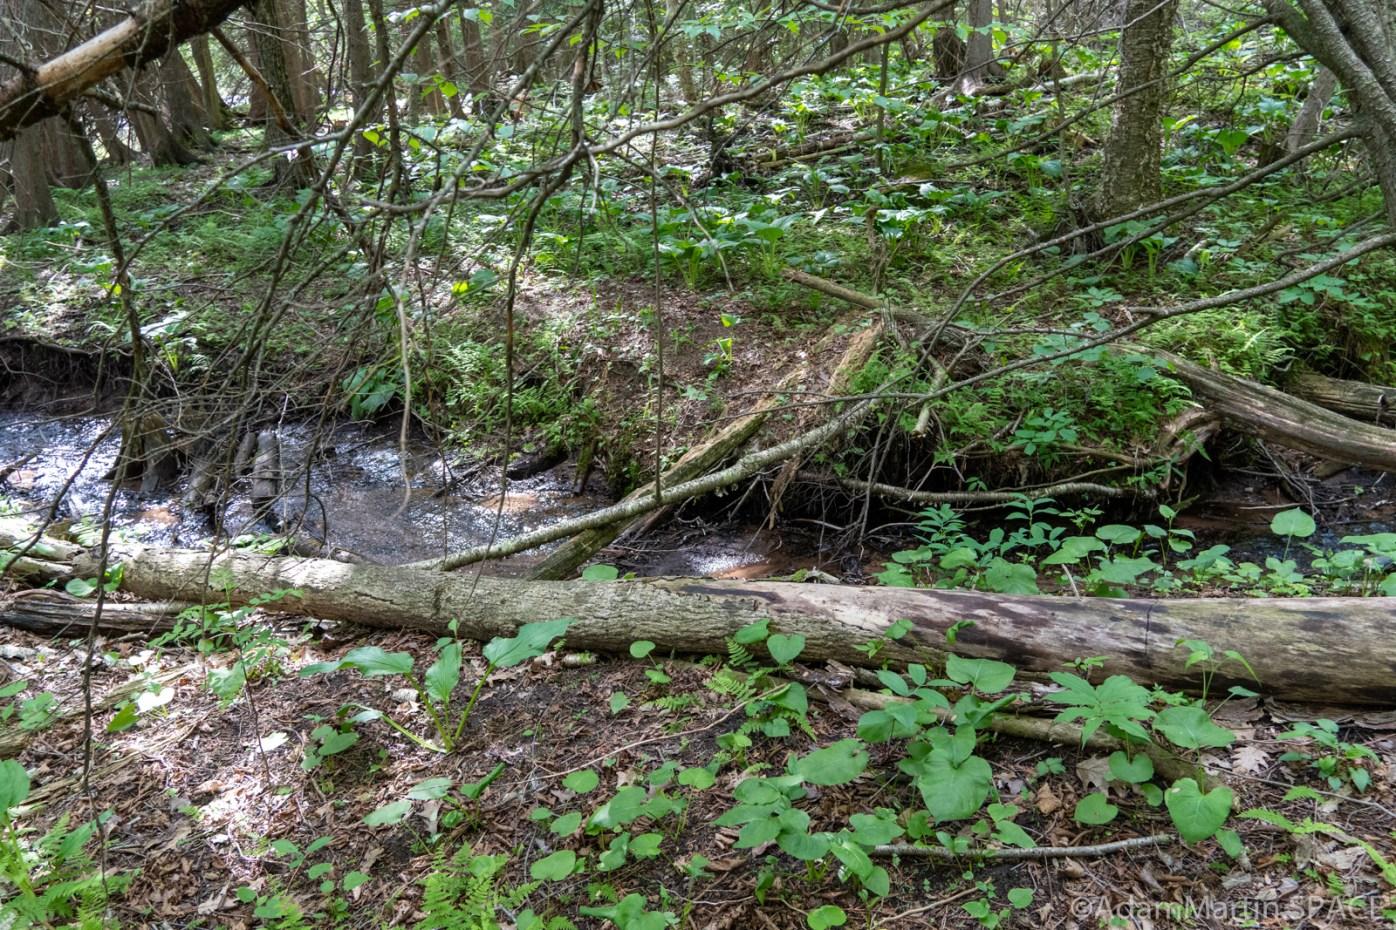 Little Bull Falls (Shawano) - Small runoff crossing